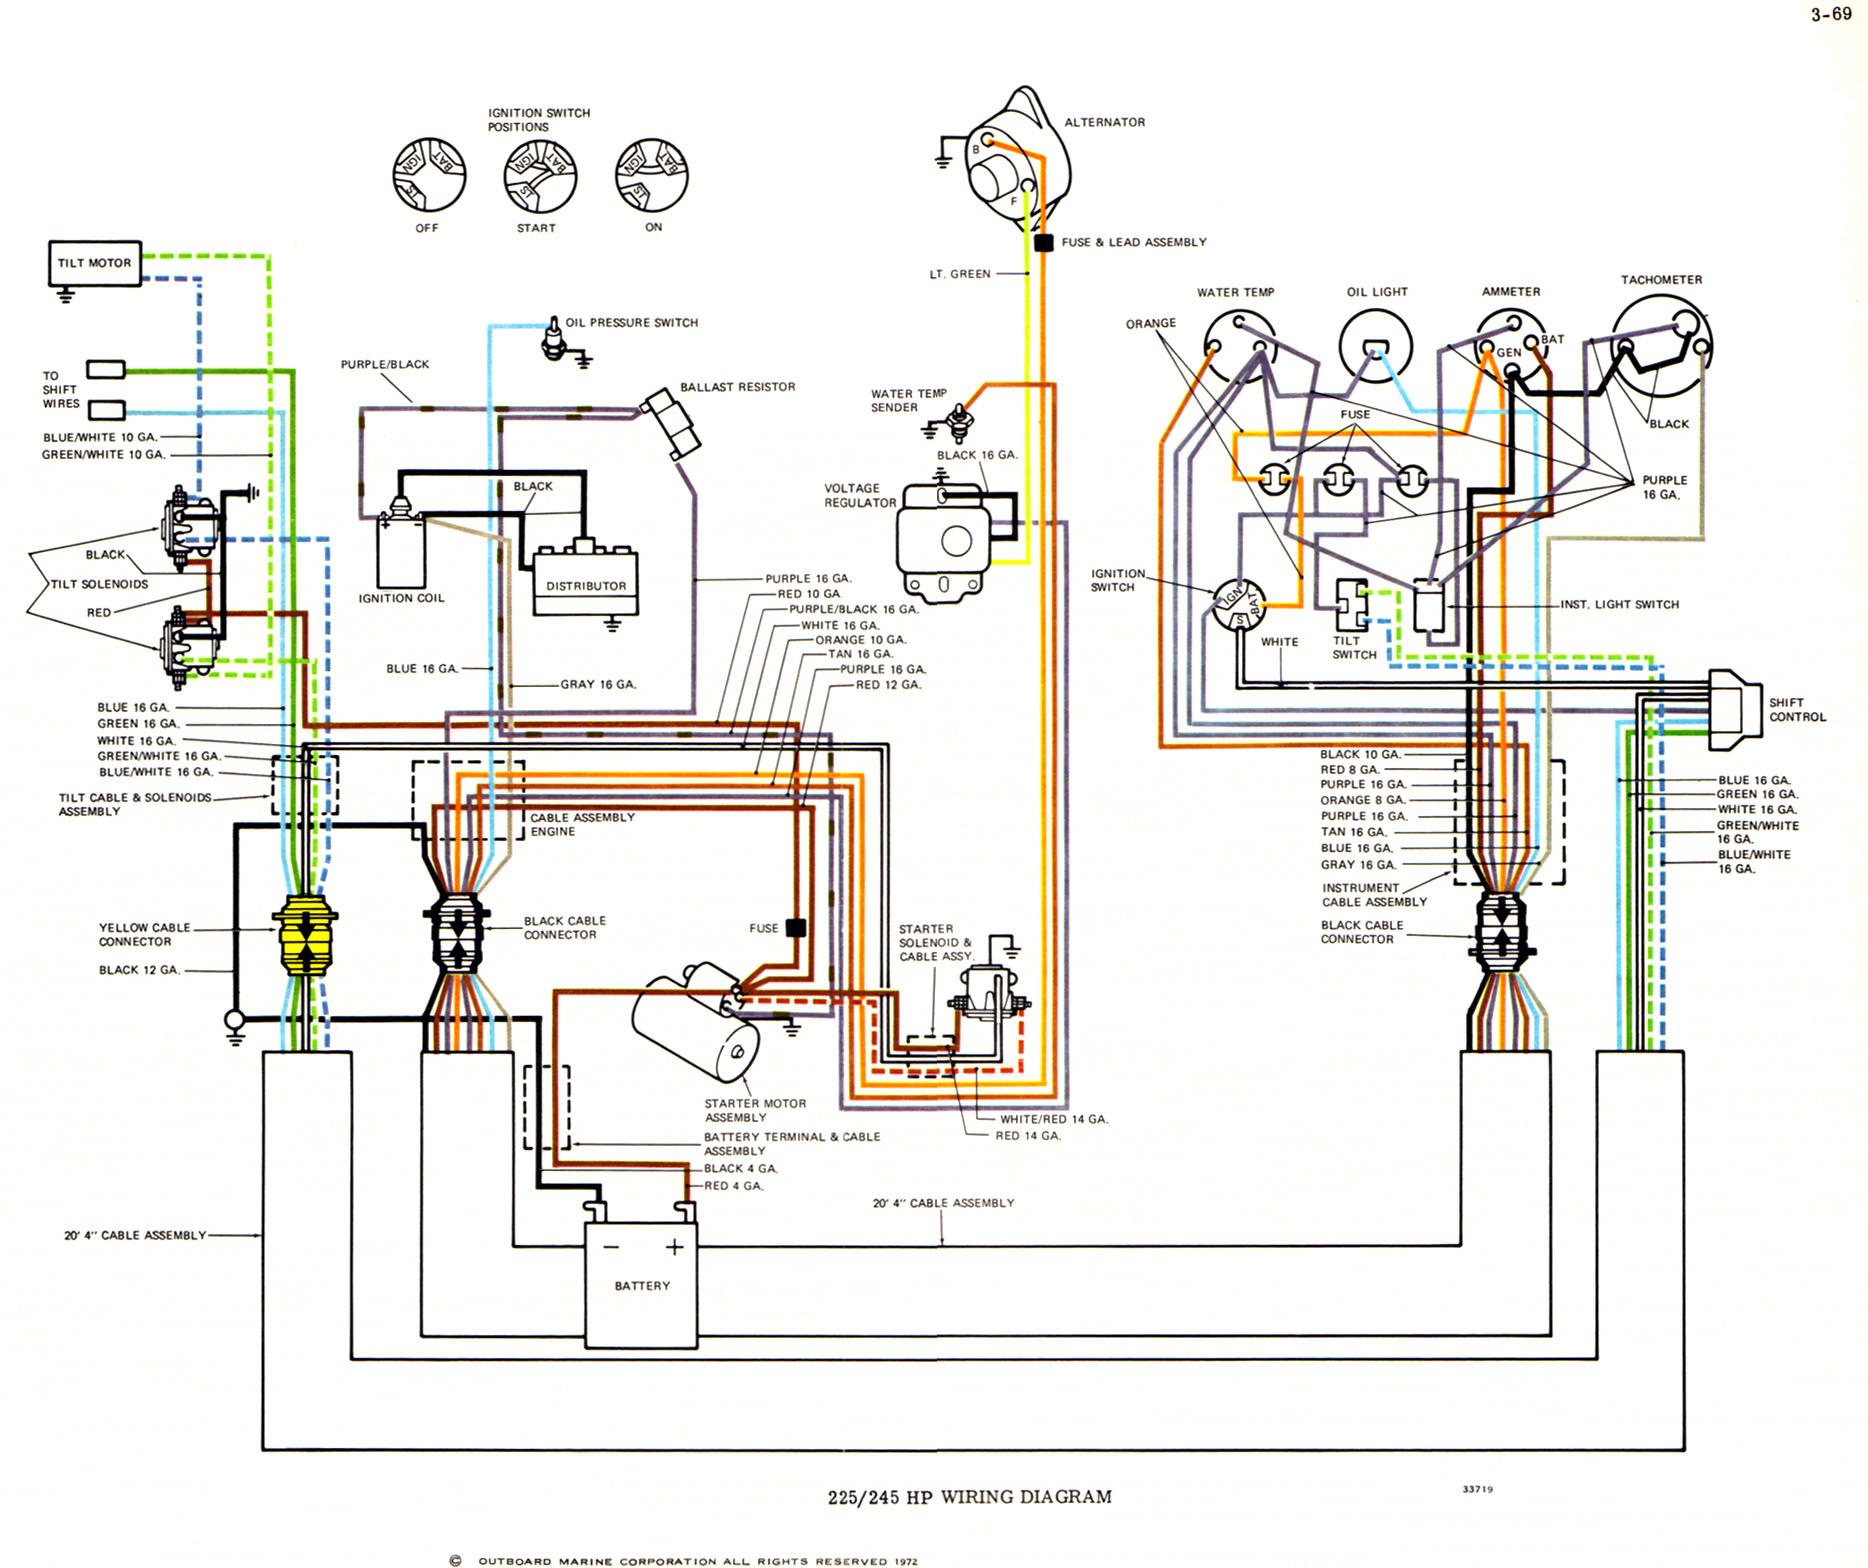 Mercruiser Tachometer Wiring | Schematic Diagram - Yamaha Outboard Wiring Harness Diagram